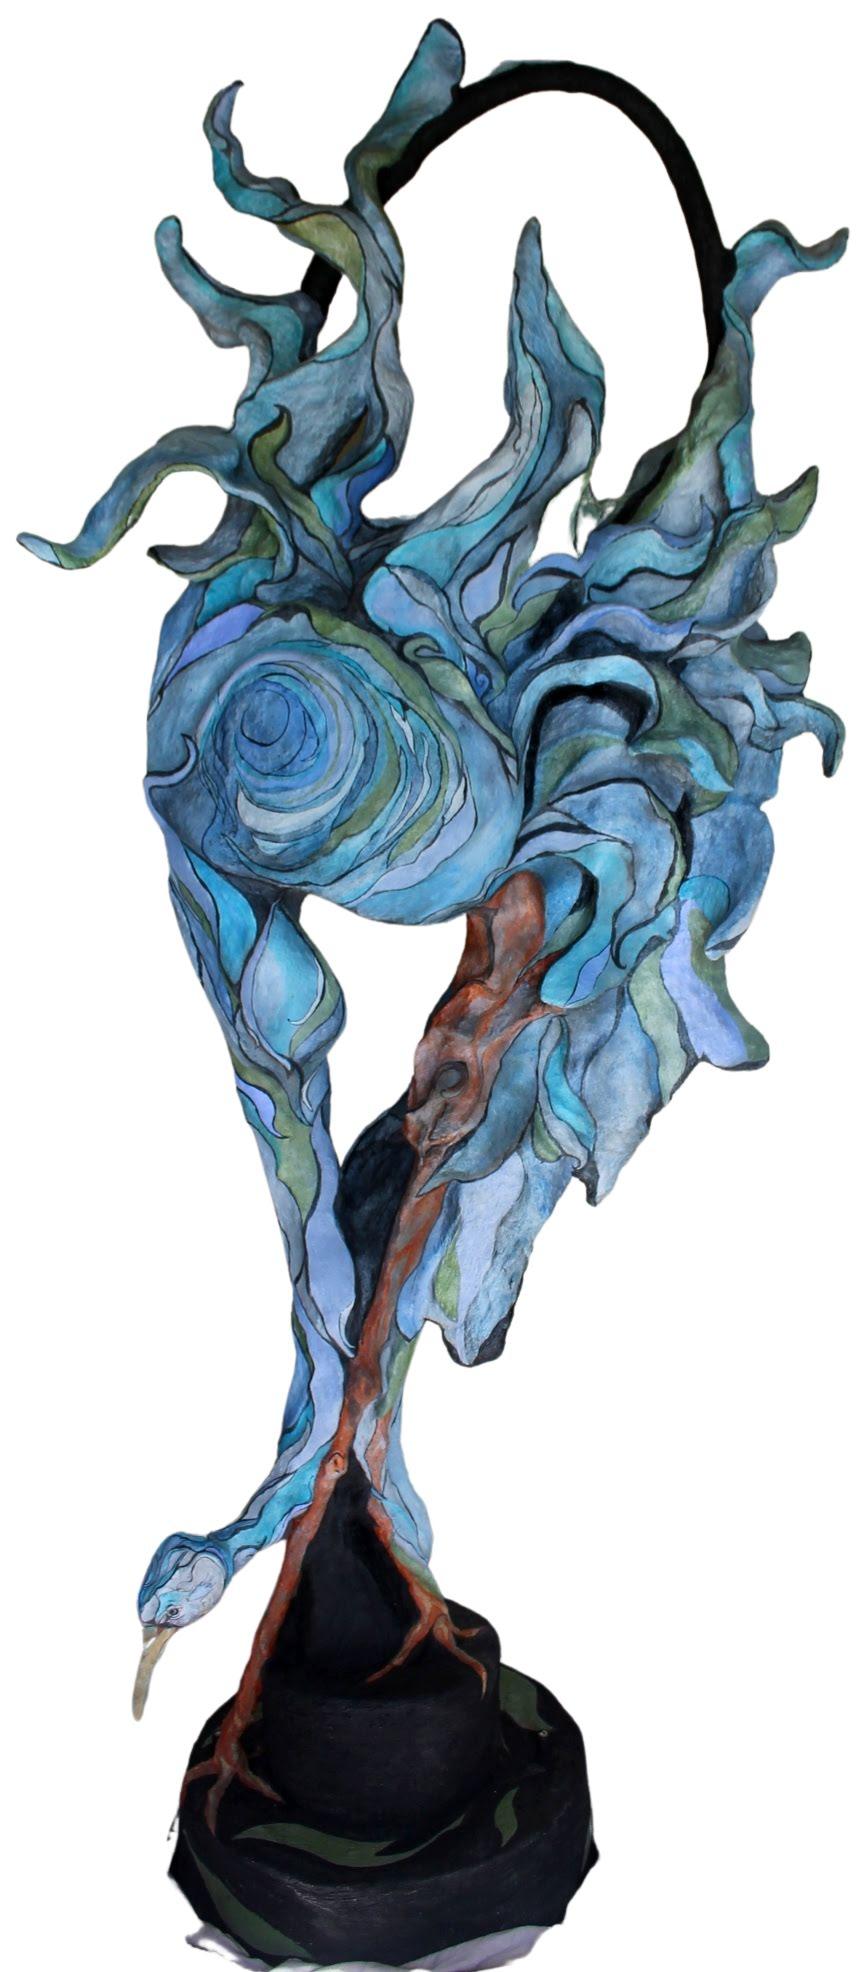 Fernando – Blue Heron series #2